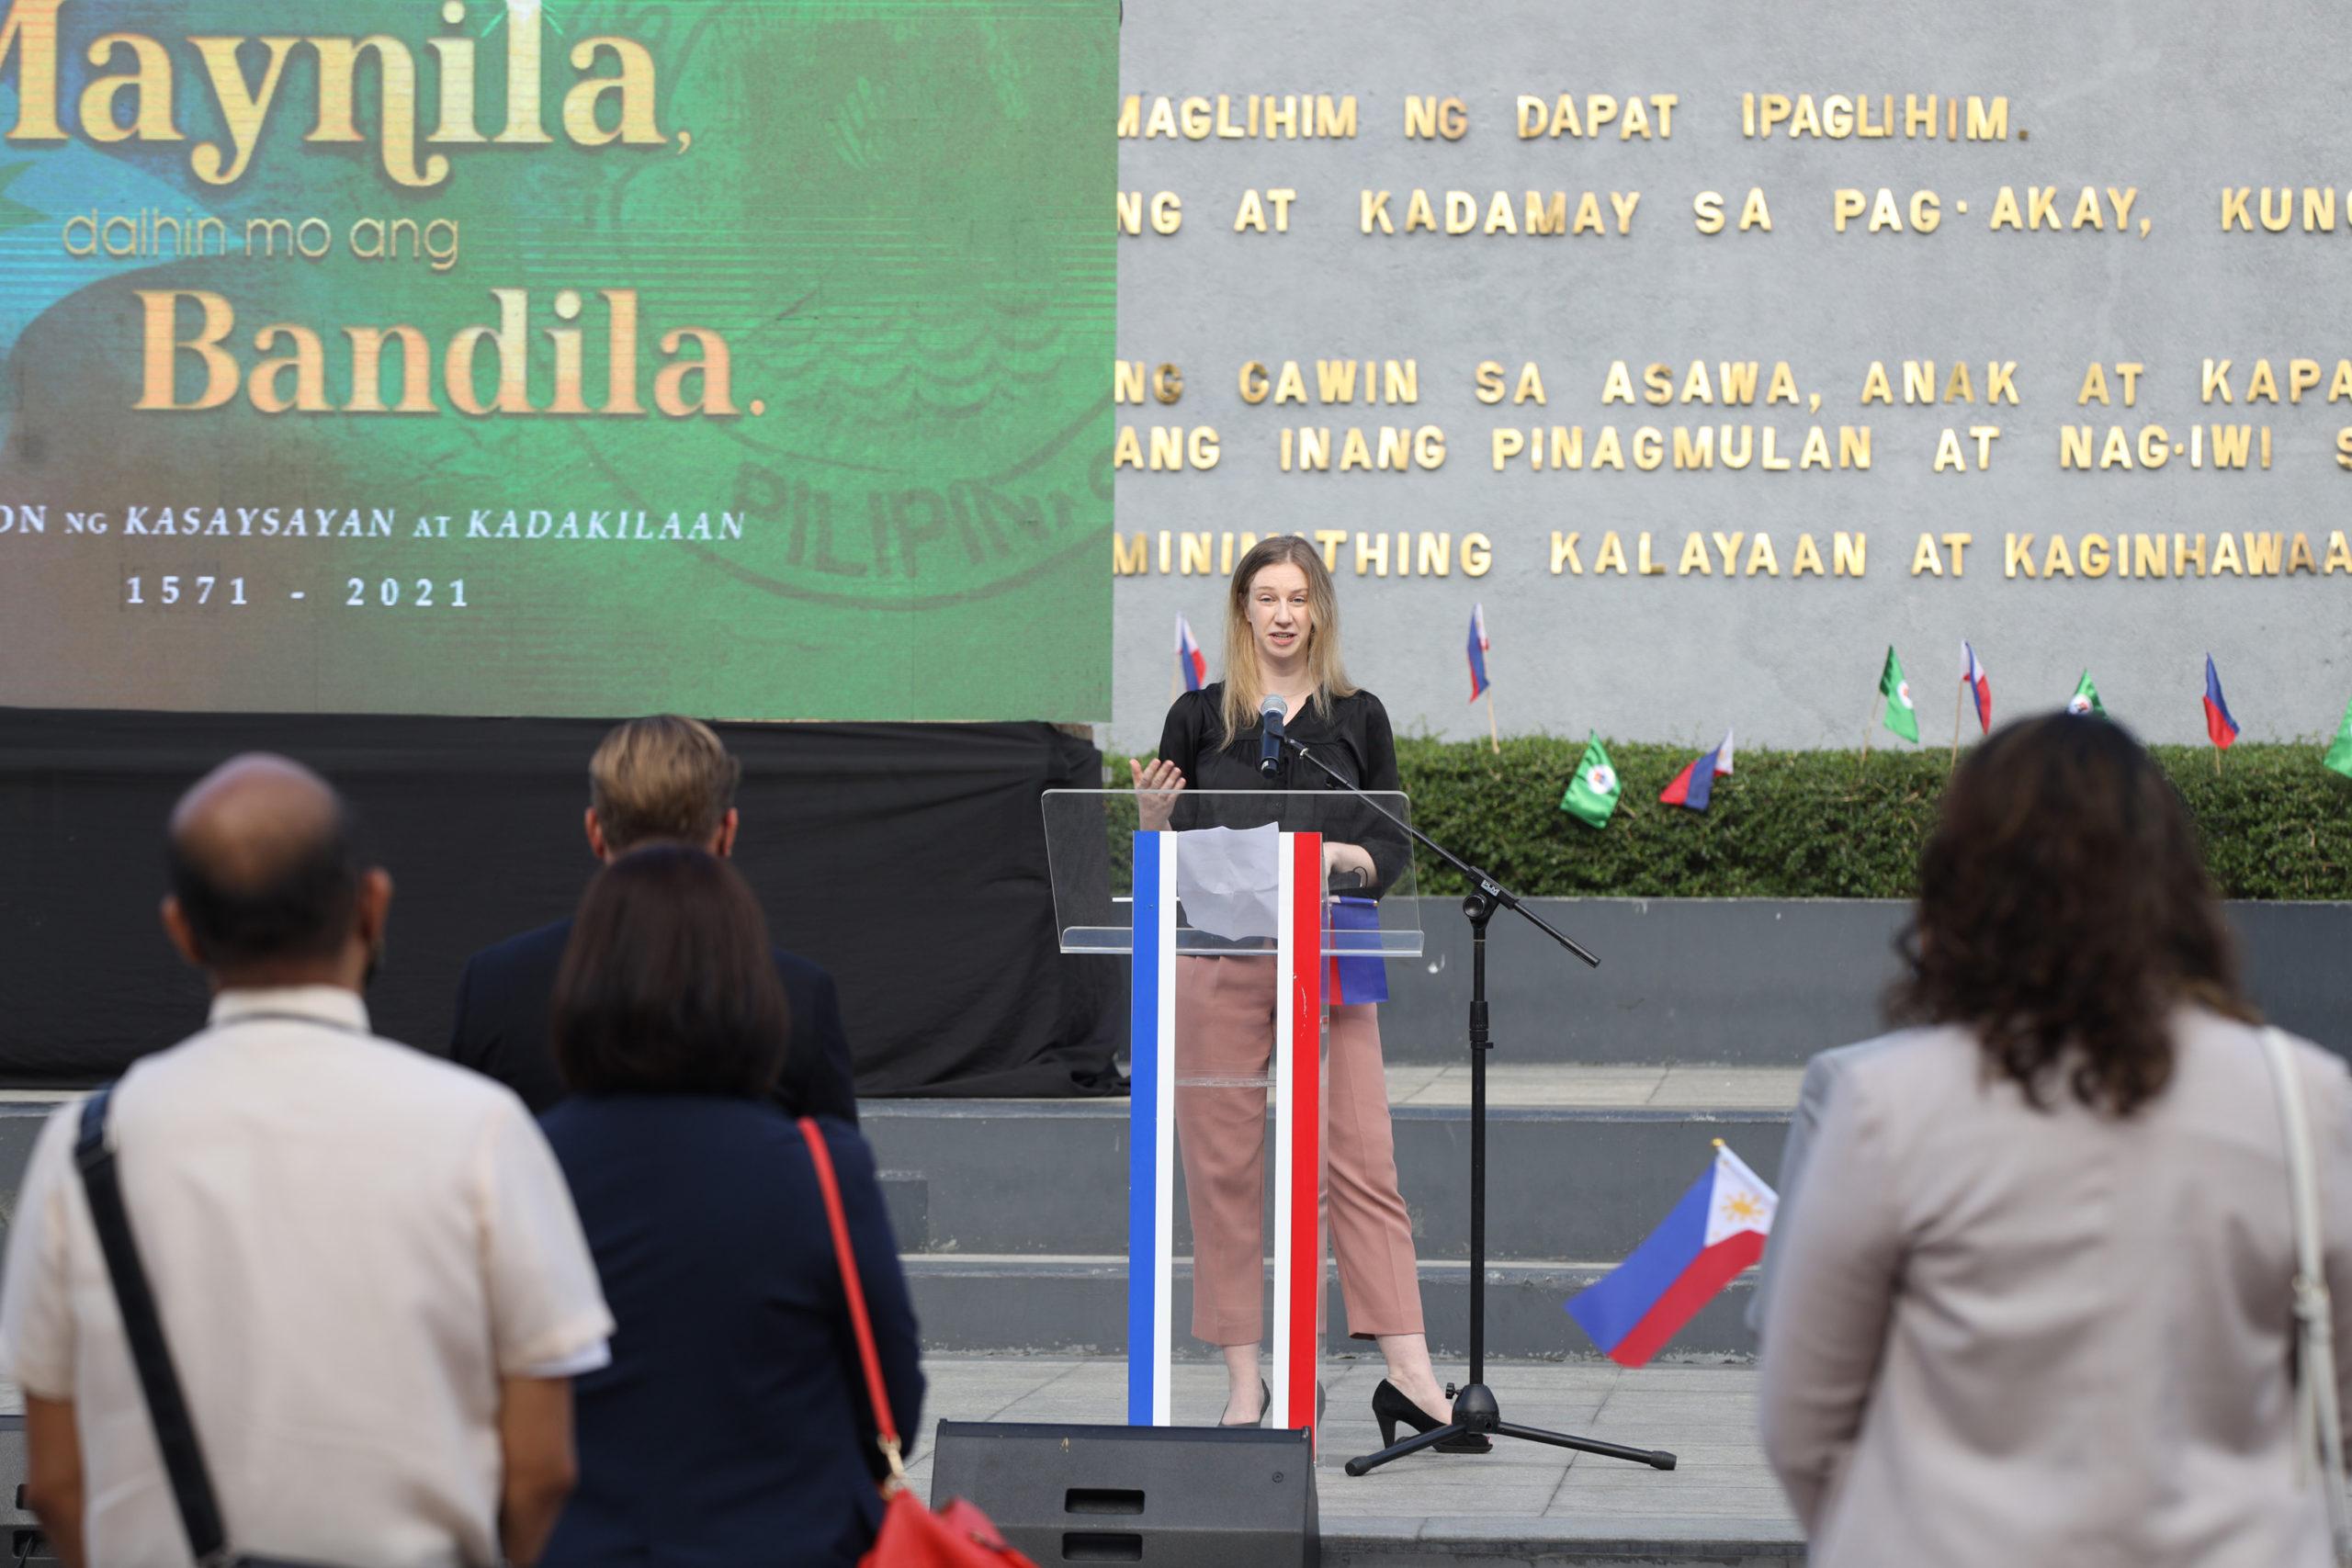 Laura Oexle, German Embassy Deputy Head of Mission